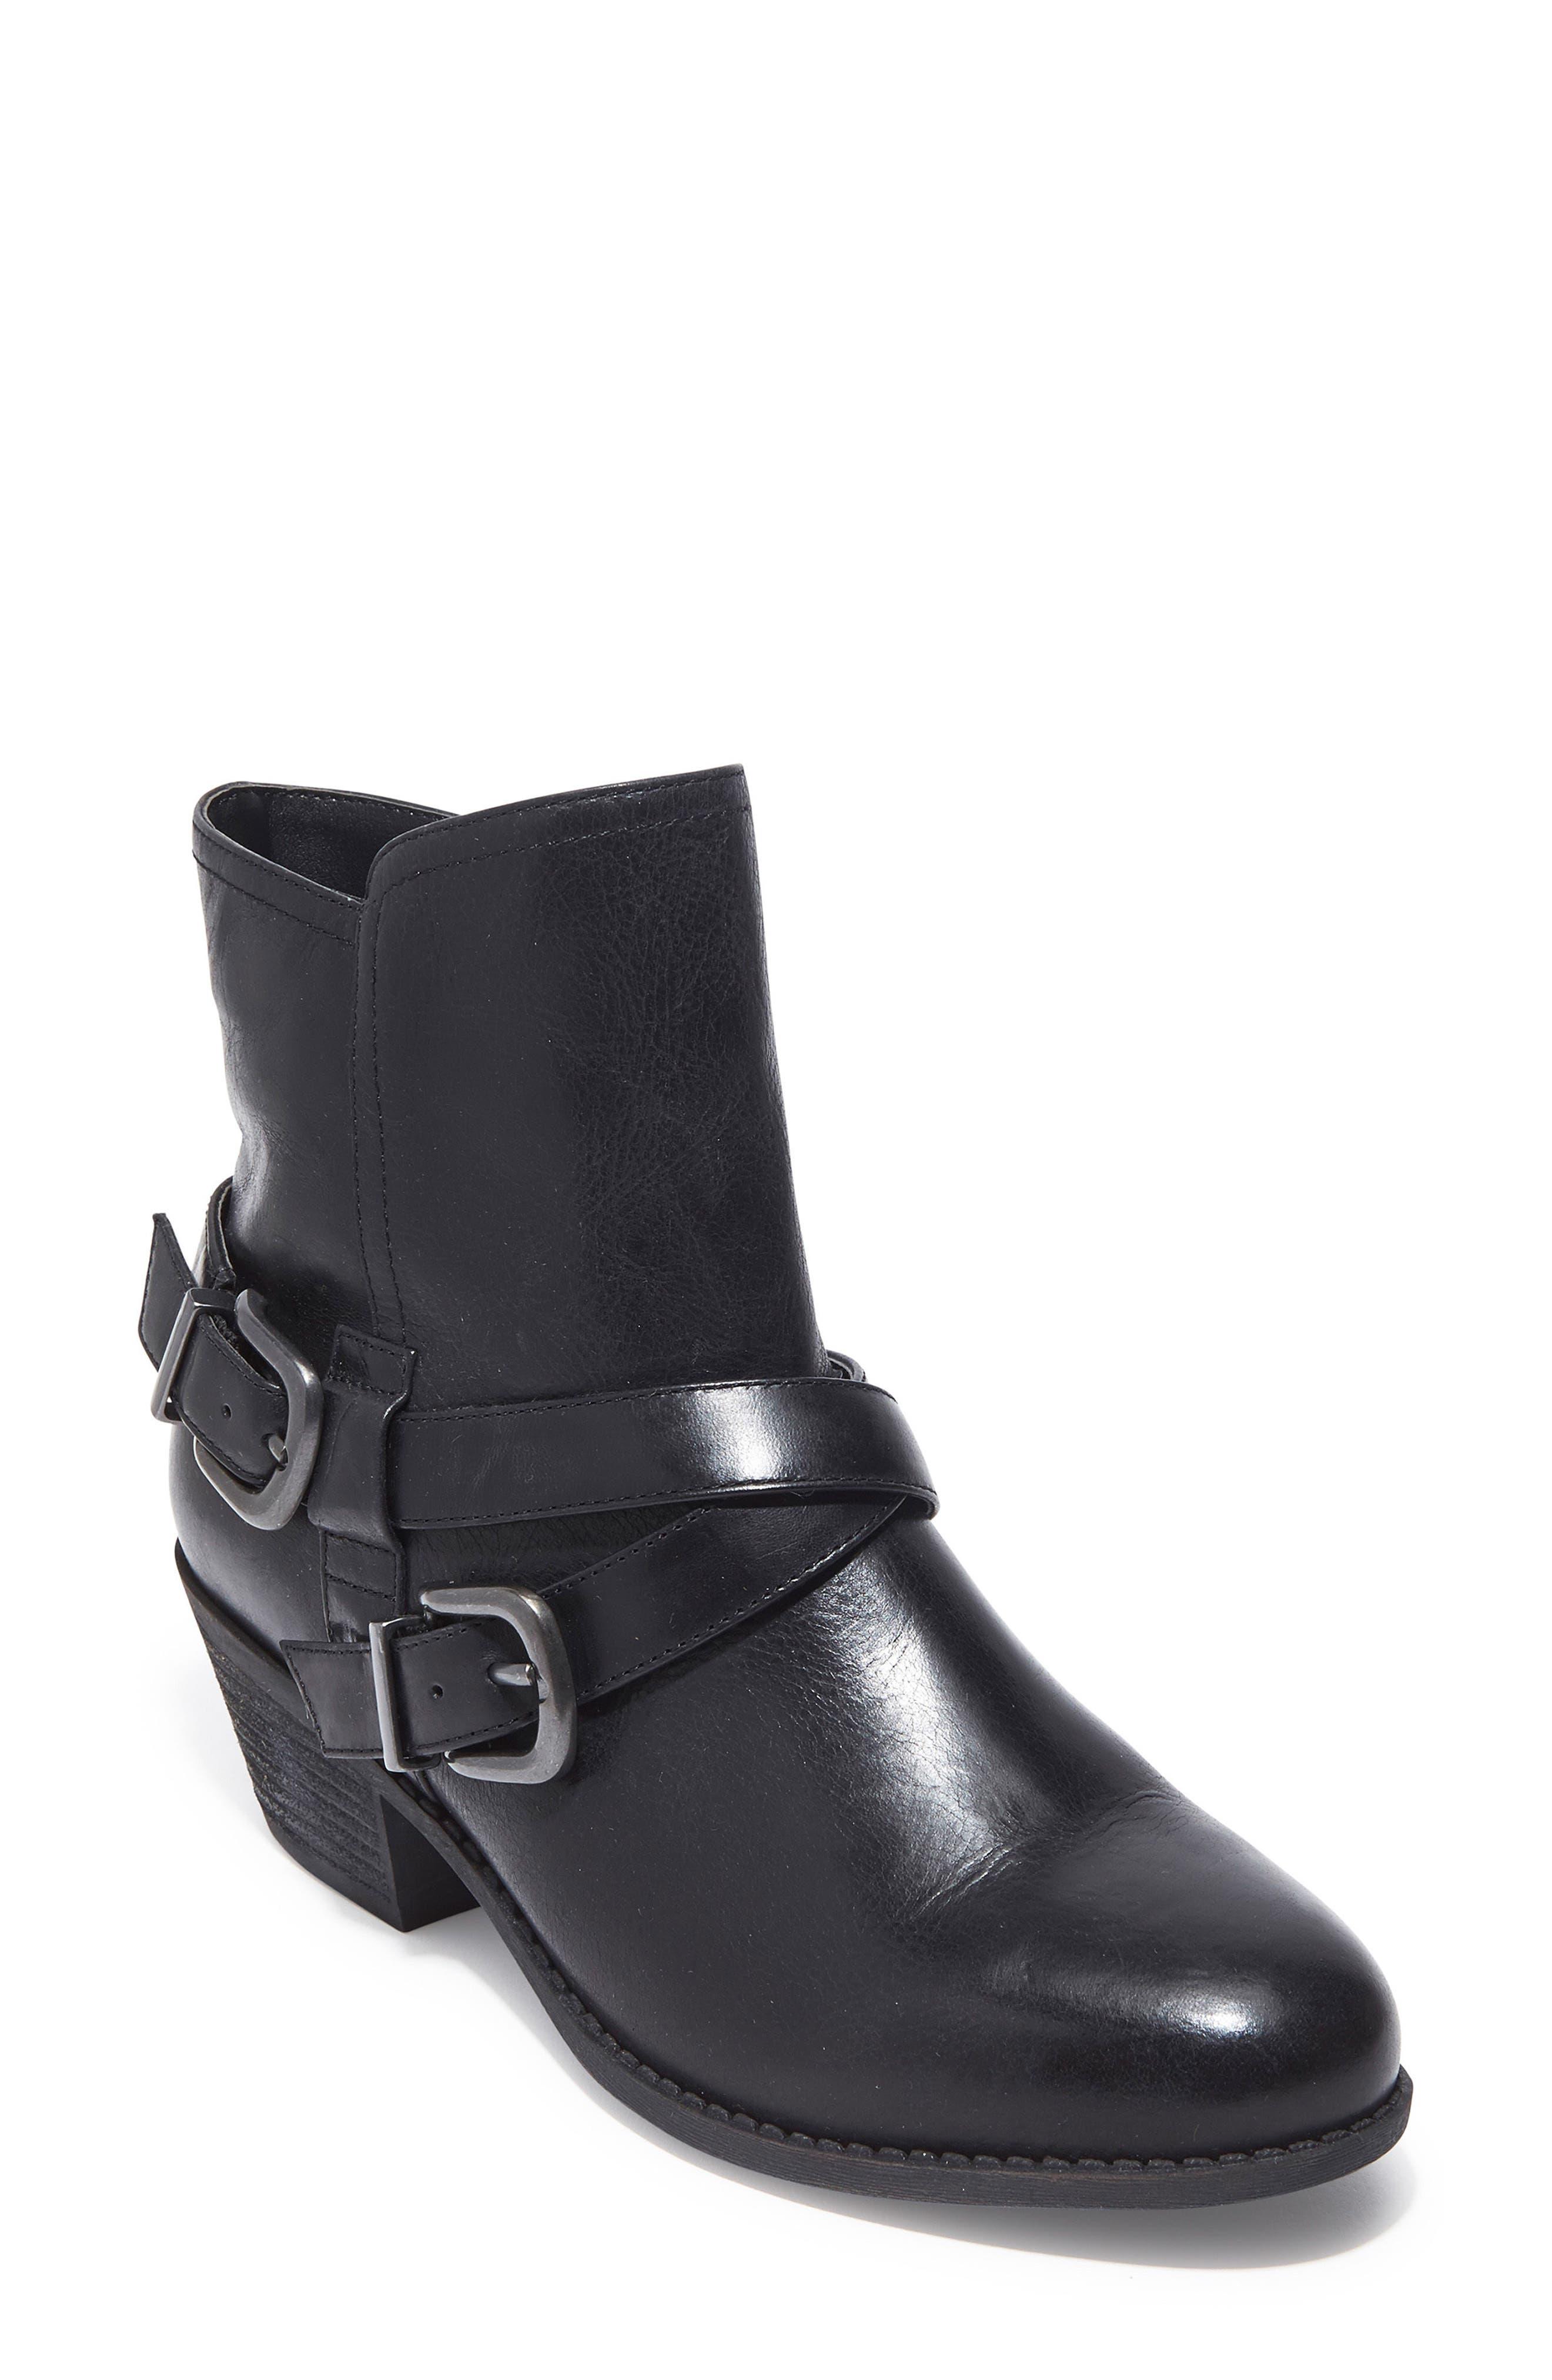 Alternate Image 1 Selected - Me Too Zuri Buckle Boot (Women)